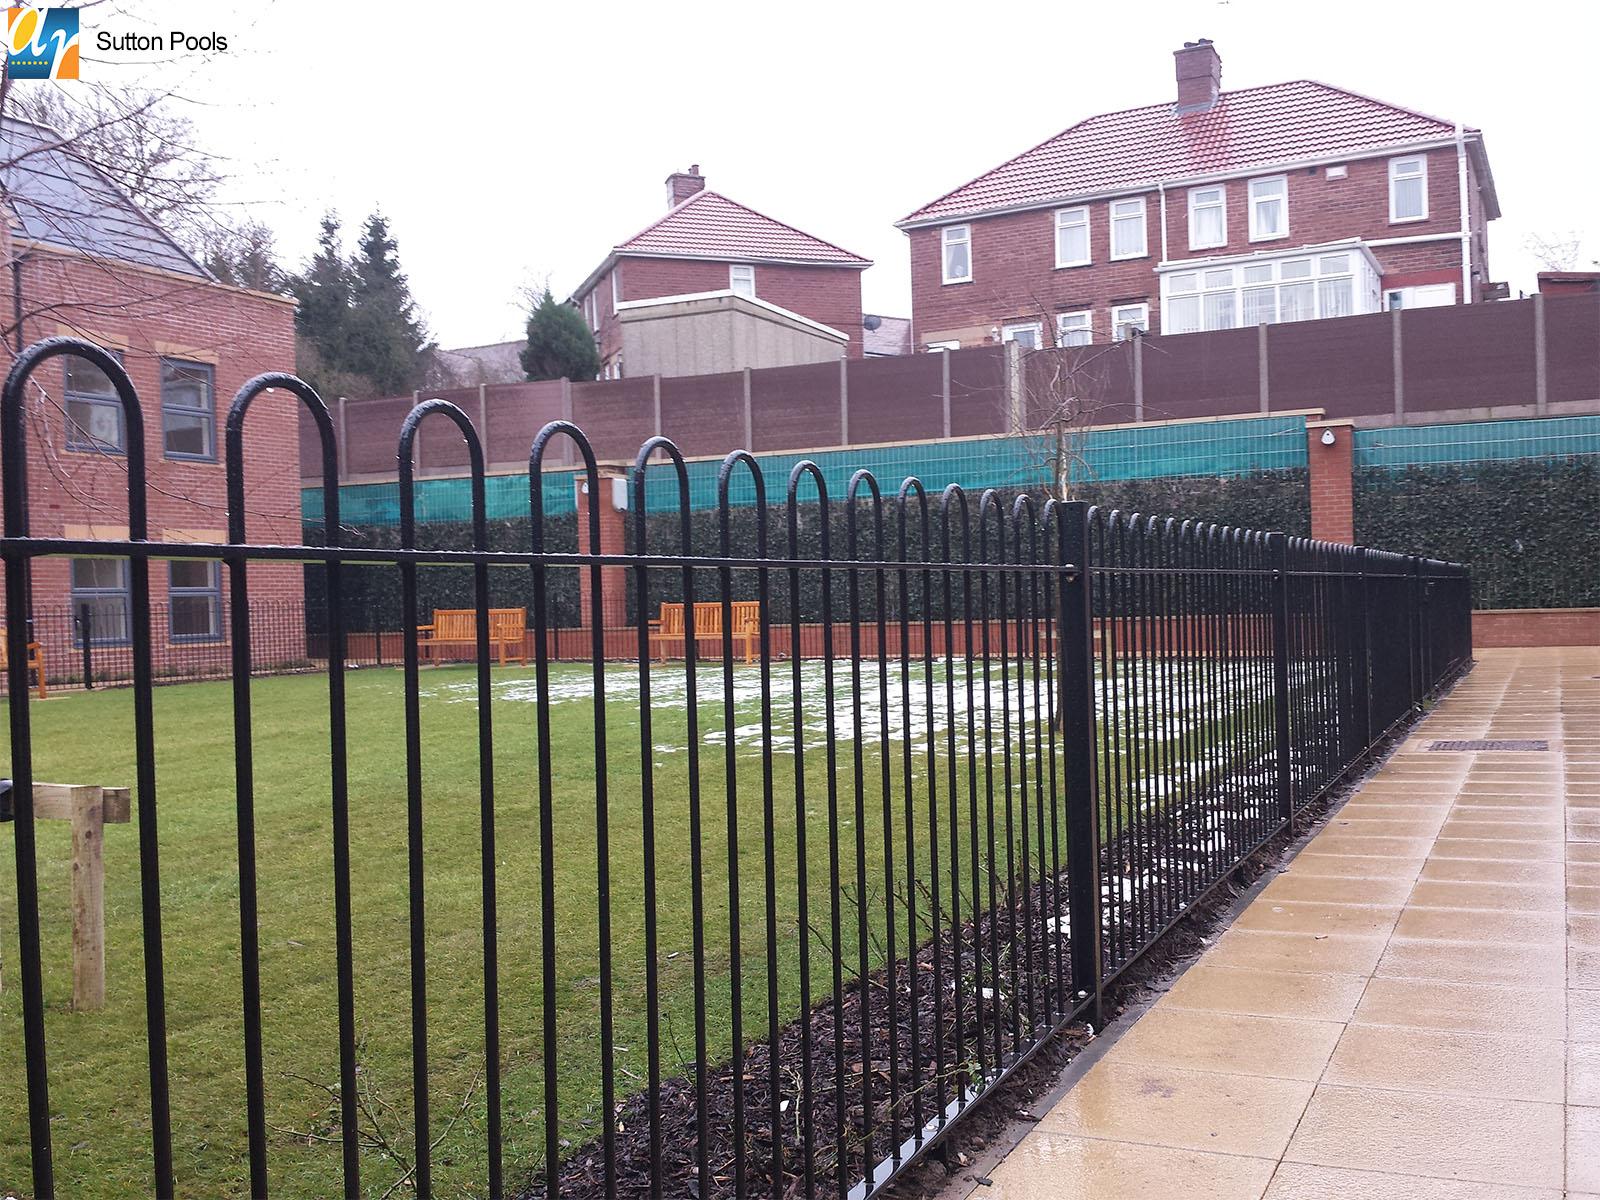 Sutton Pools standard bow top railings